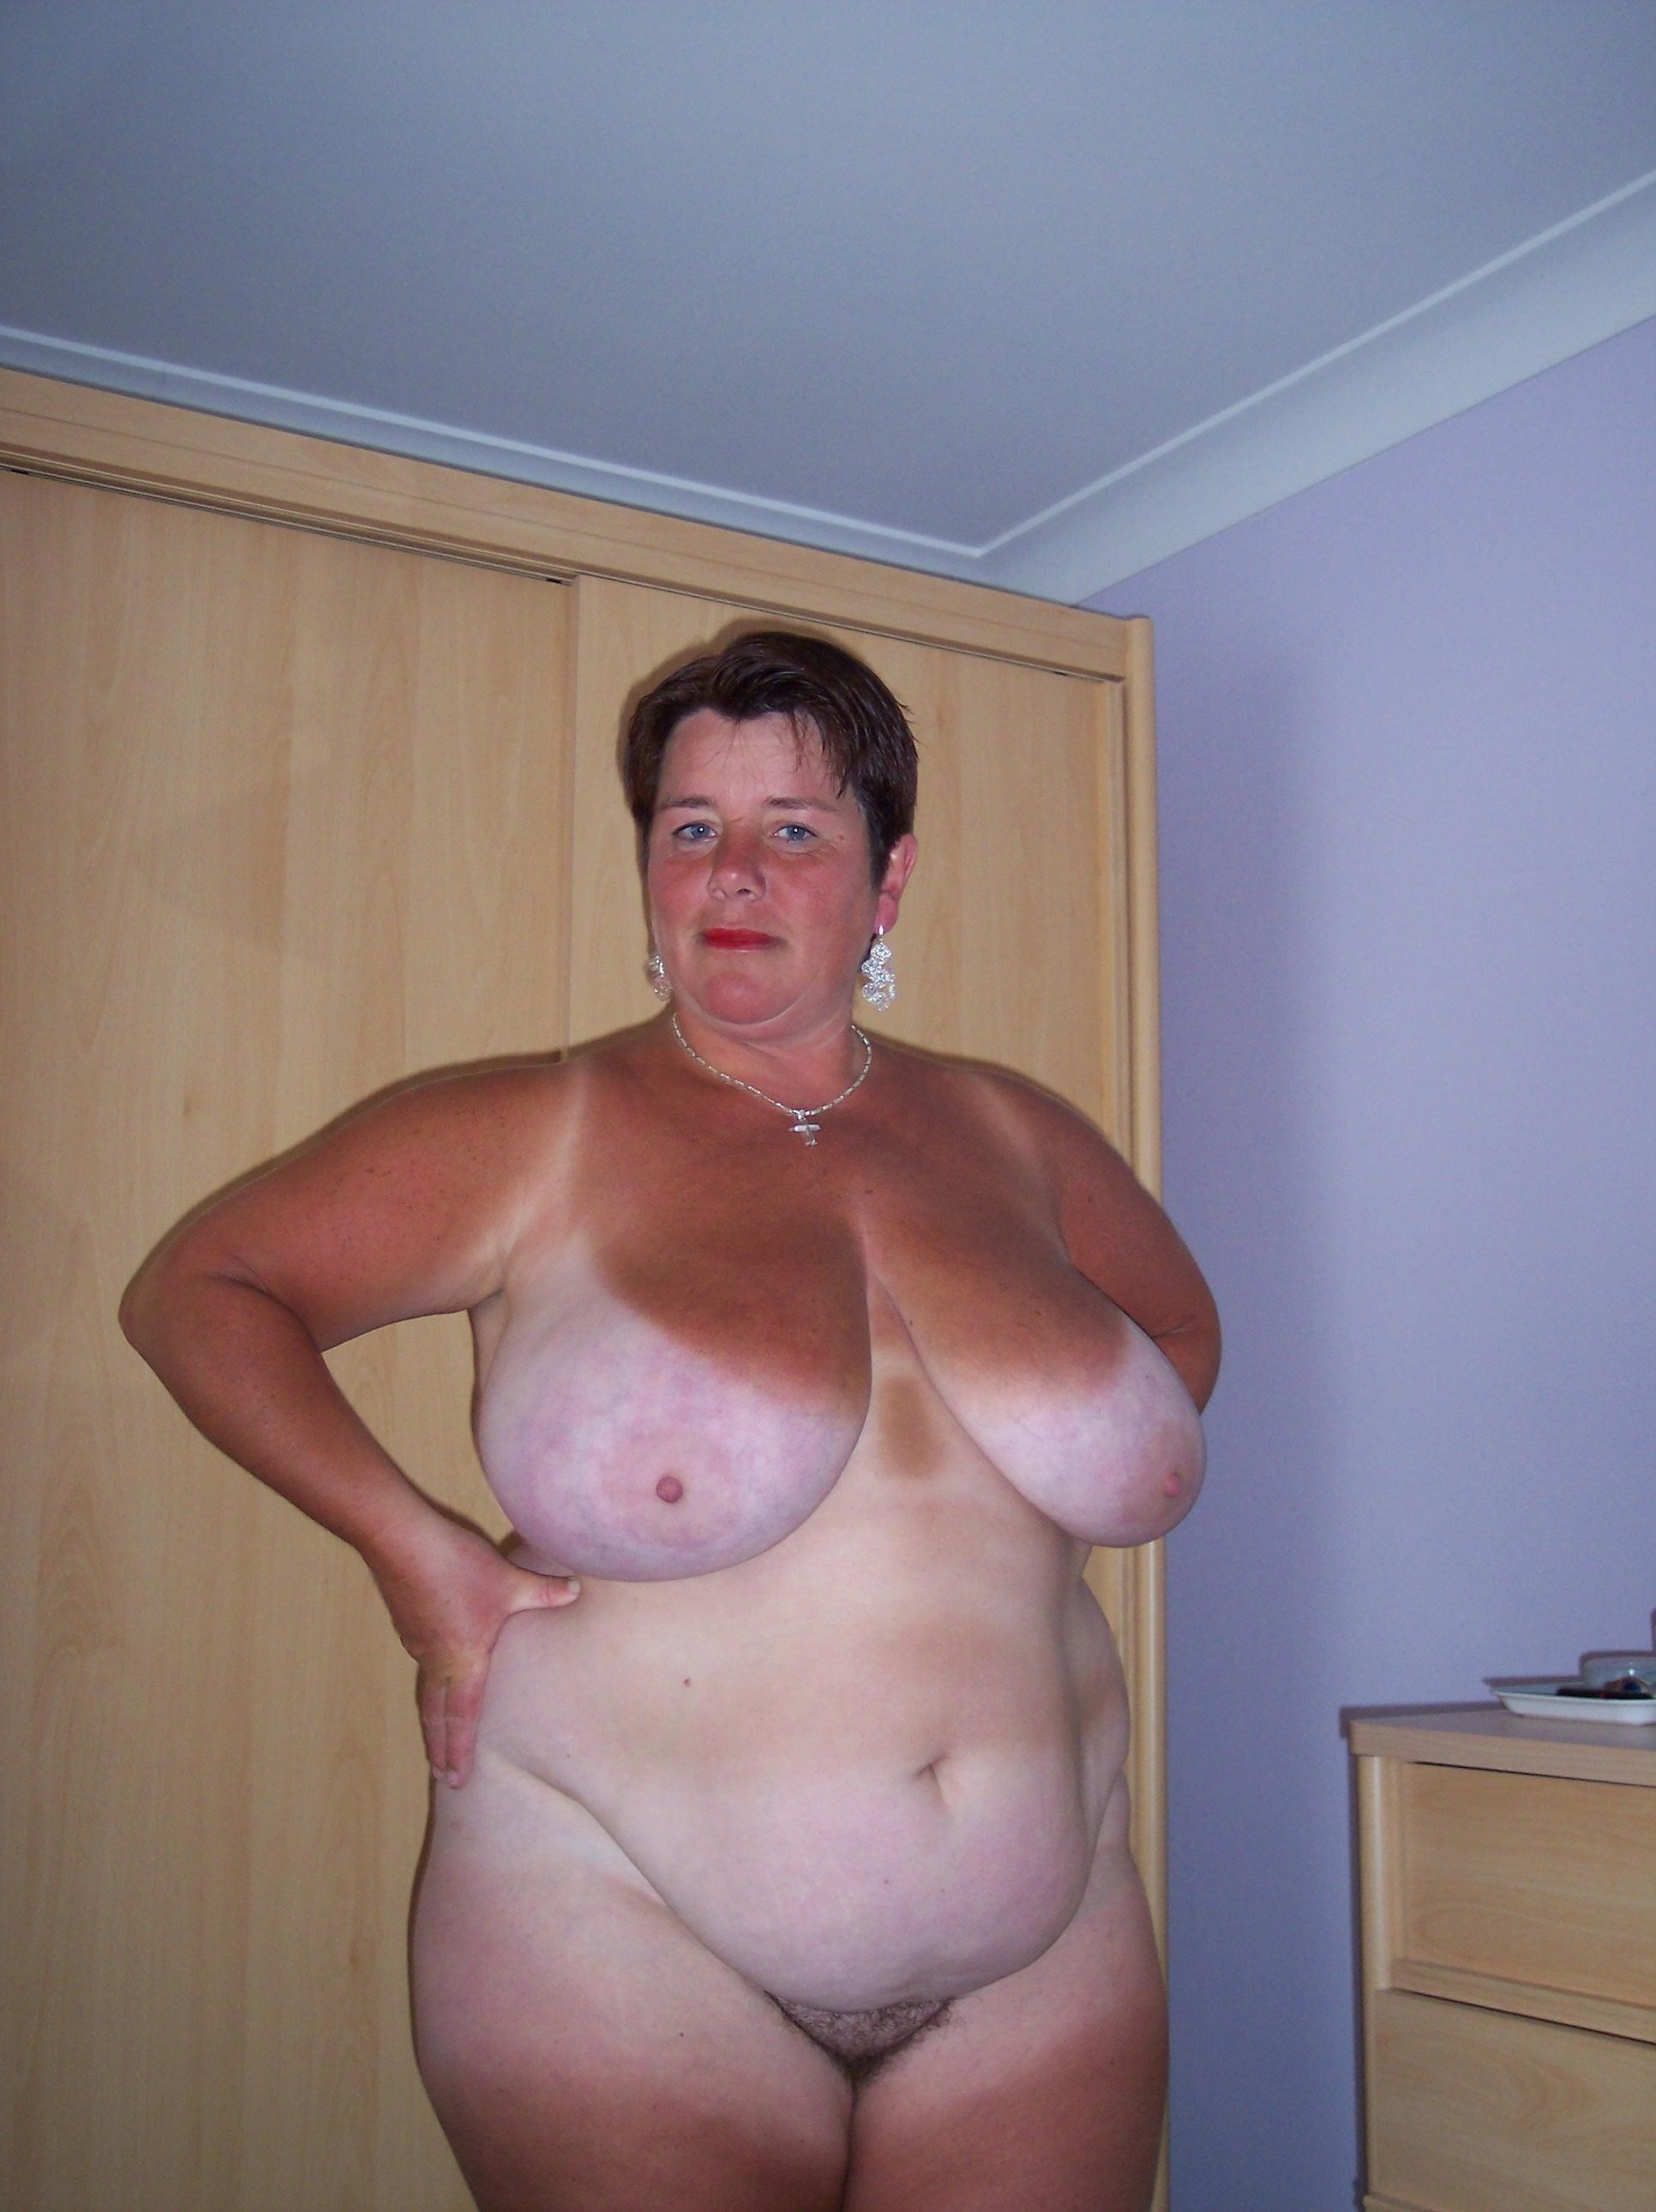 homemade mature nudism - Homemade mature bbw nude women